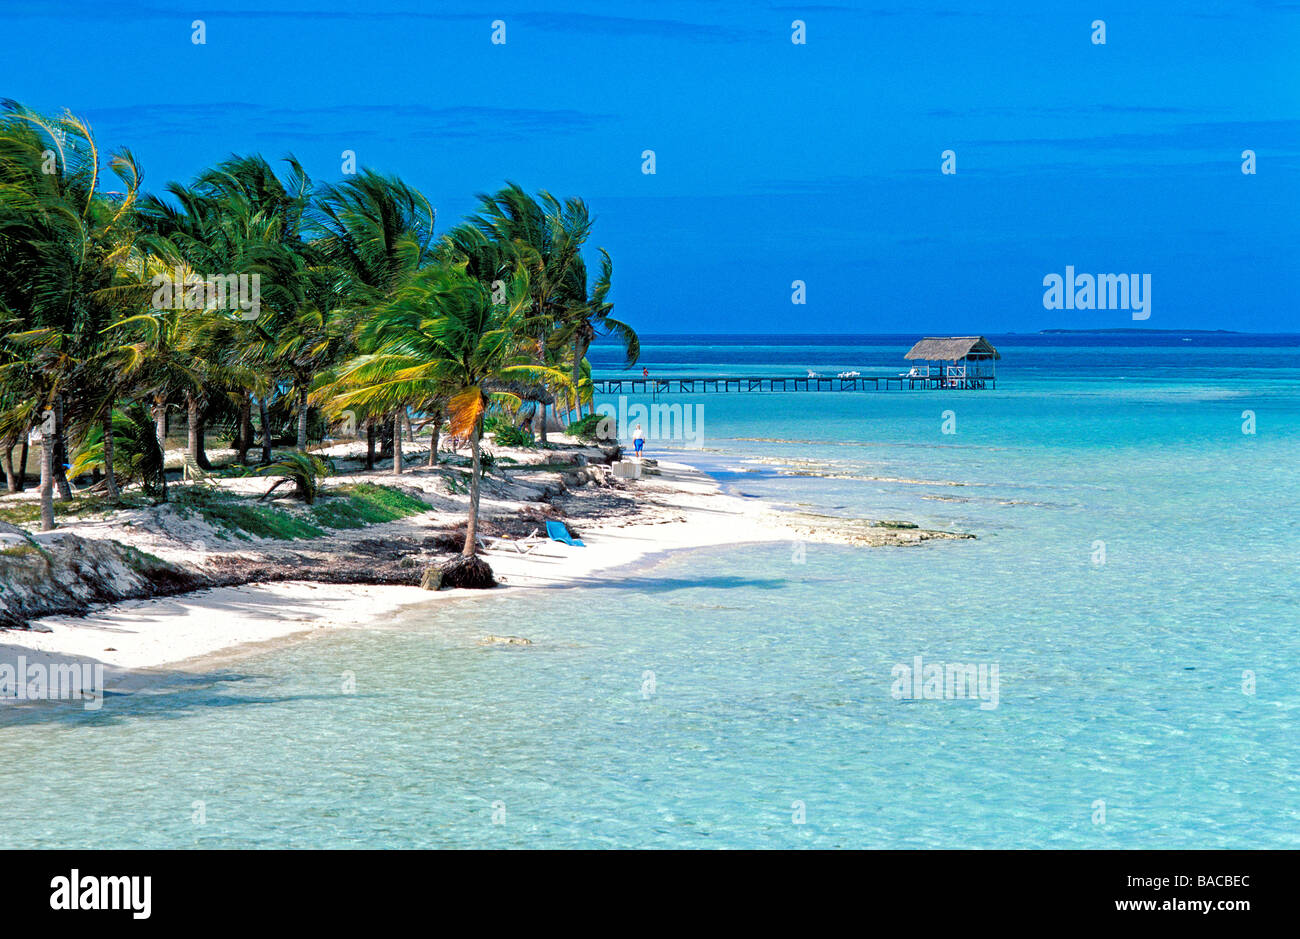 SOL CAYO GUILLERMO $118 ($̶1̶4̶2̶) - Updated 2018 Prices ... |Beach Cayo Guillermo Cuba